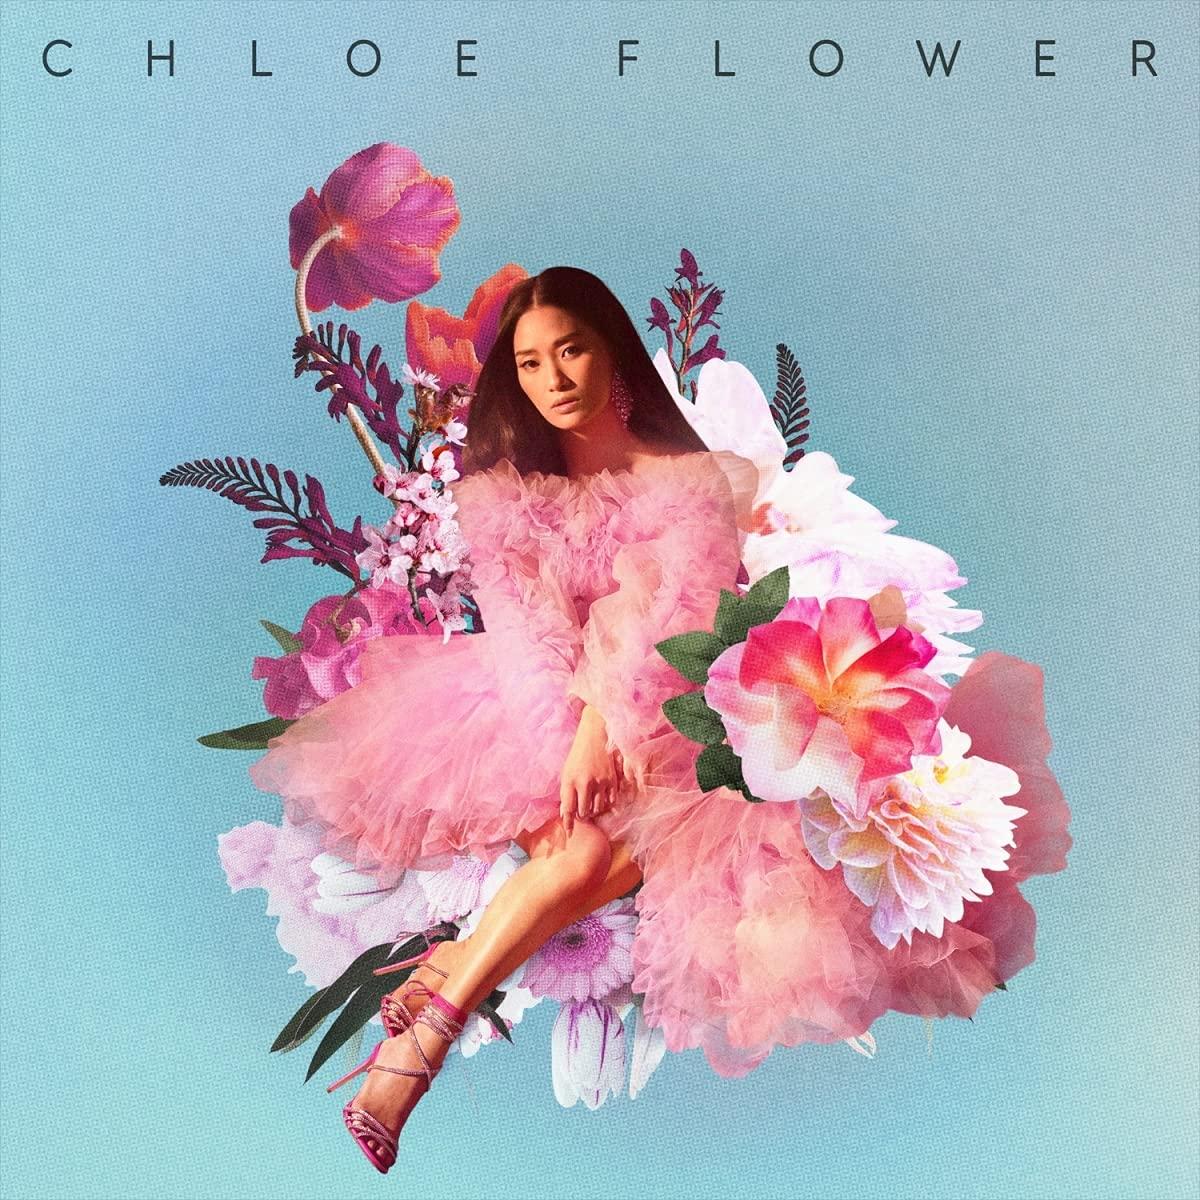 Chloe Flower - Chloe Flower (2021) [FLAC] Download